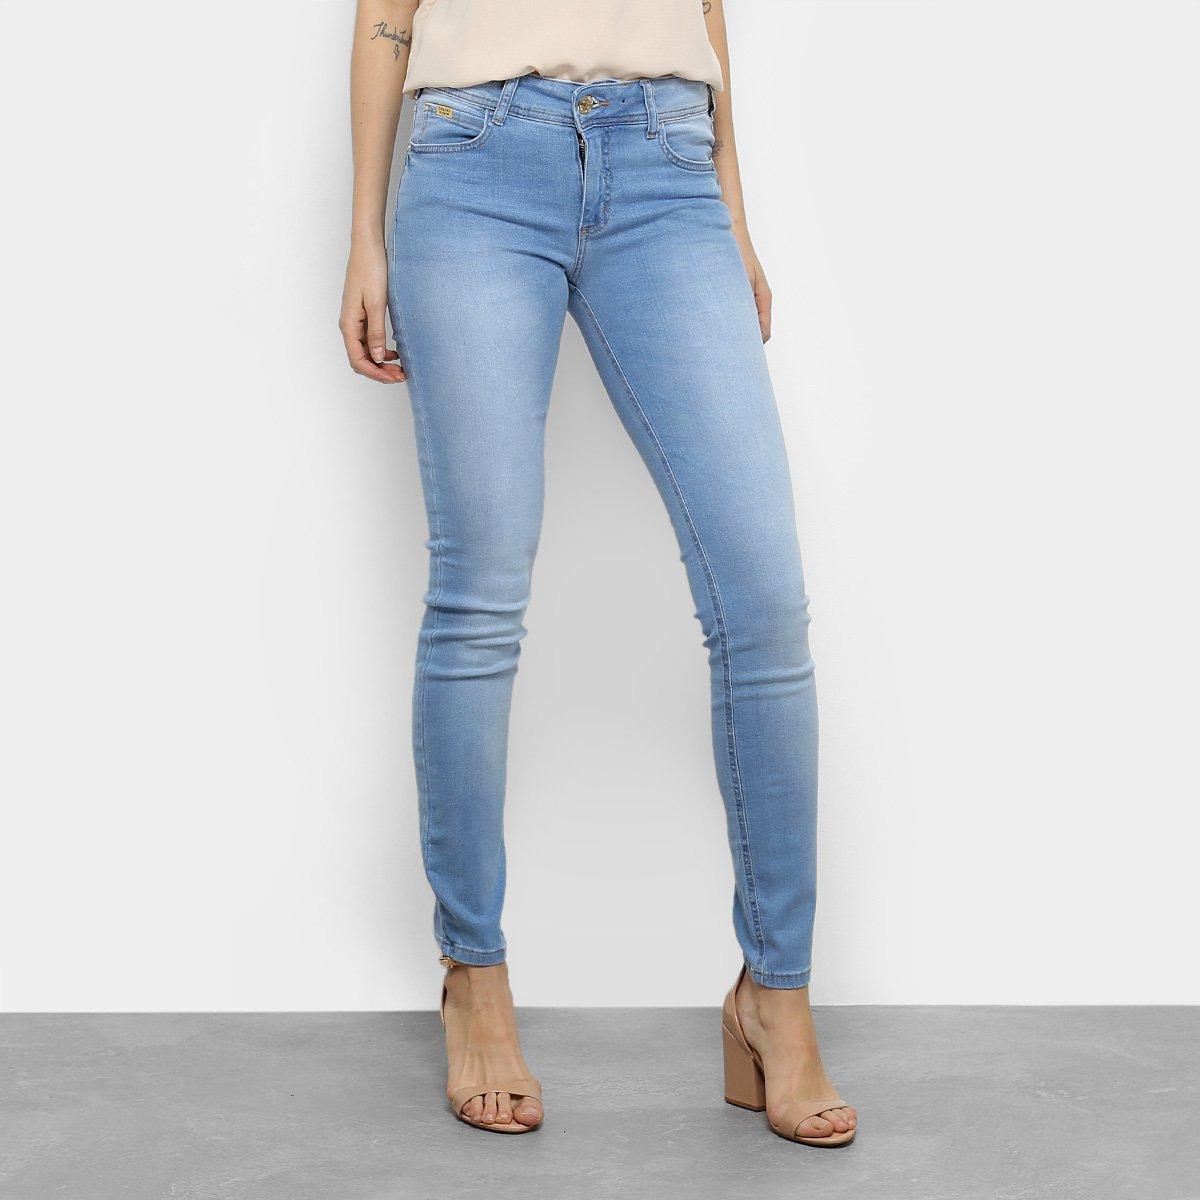 Calça Jeans Skinny Colcci Fátima Cintura Média Feminina dfbab6811af